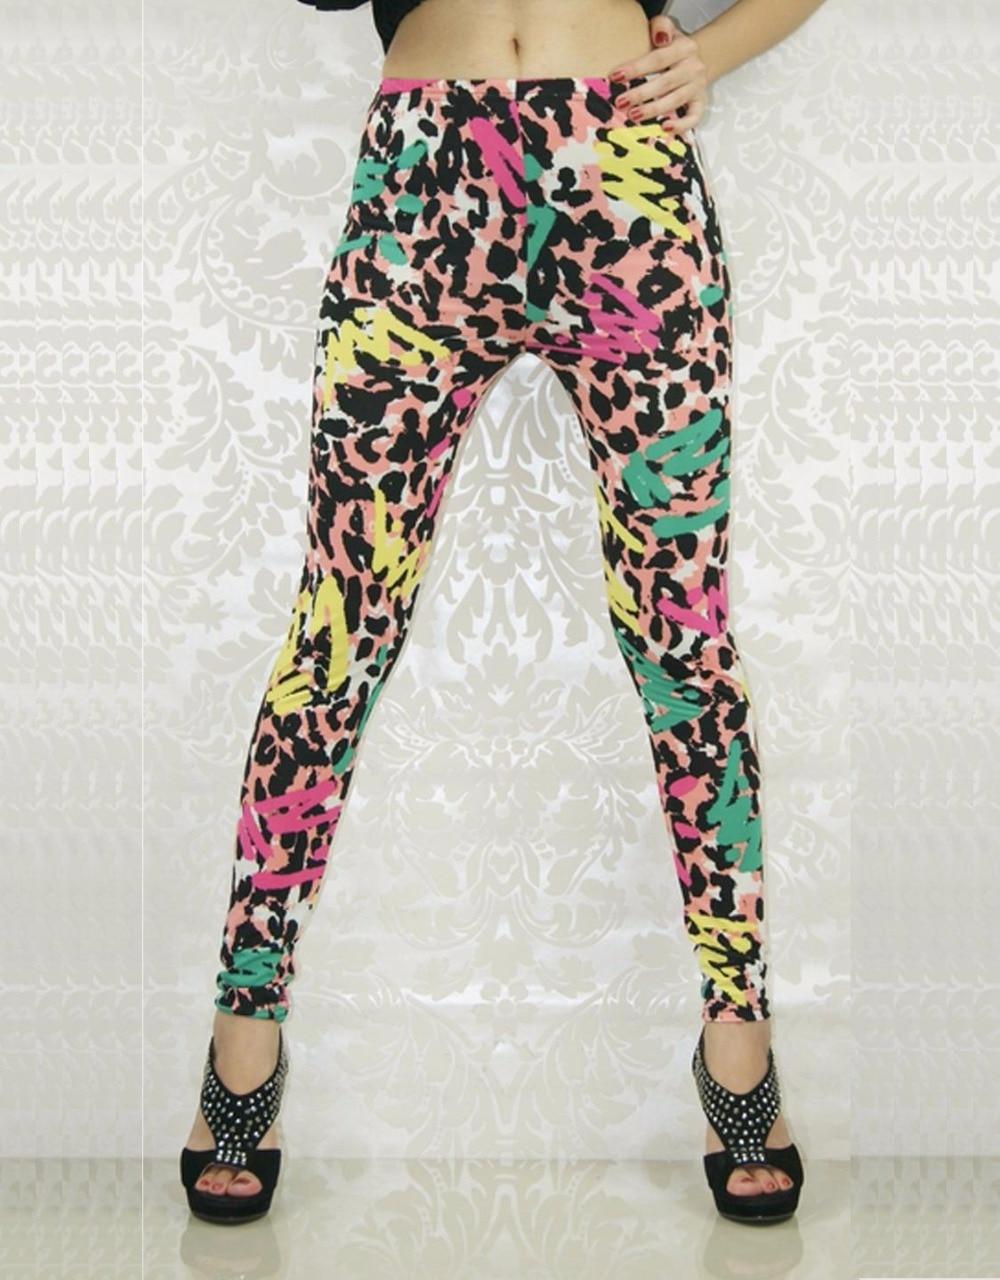 Leopard Print Women Leggings 2015 Wholesale Price Fashion Stones Textures Tattoo Sexy Print Leggings WL8038